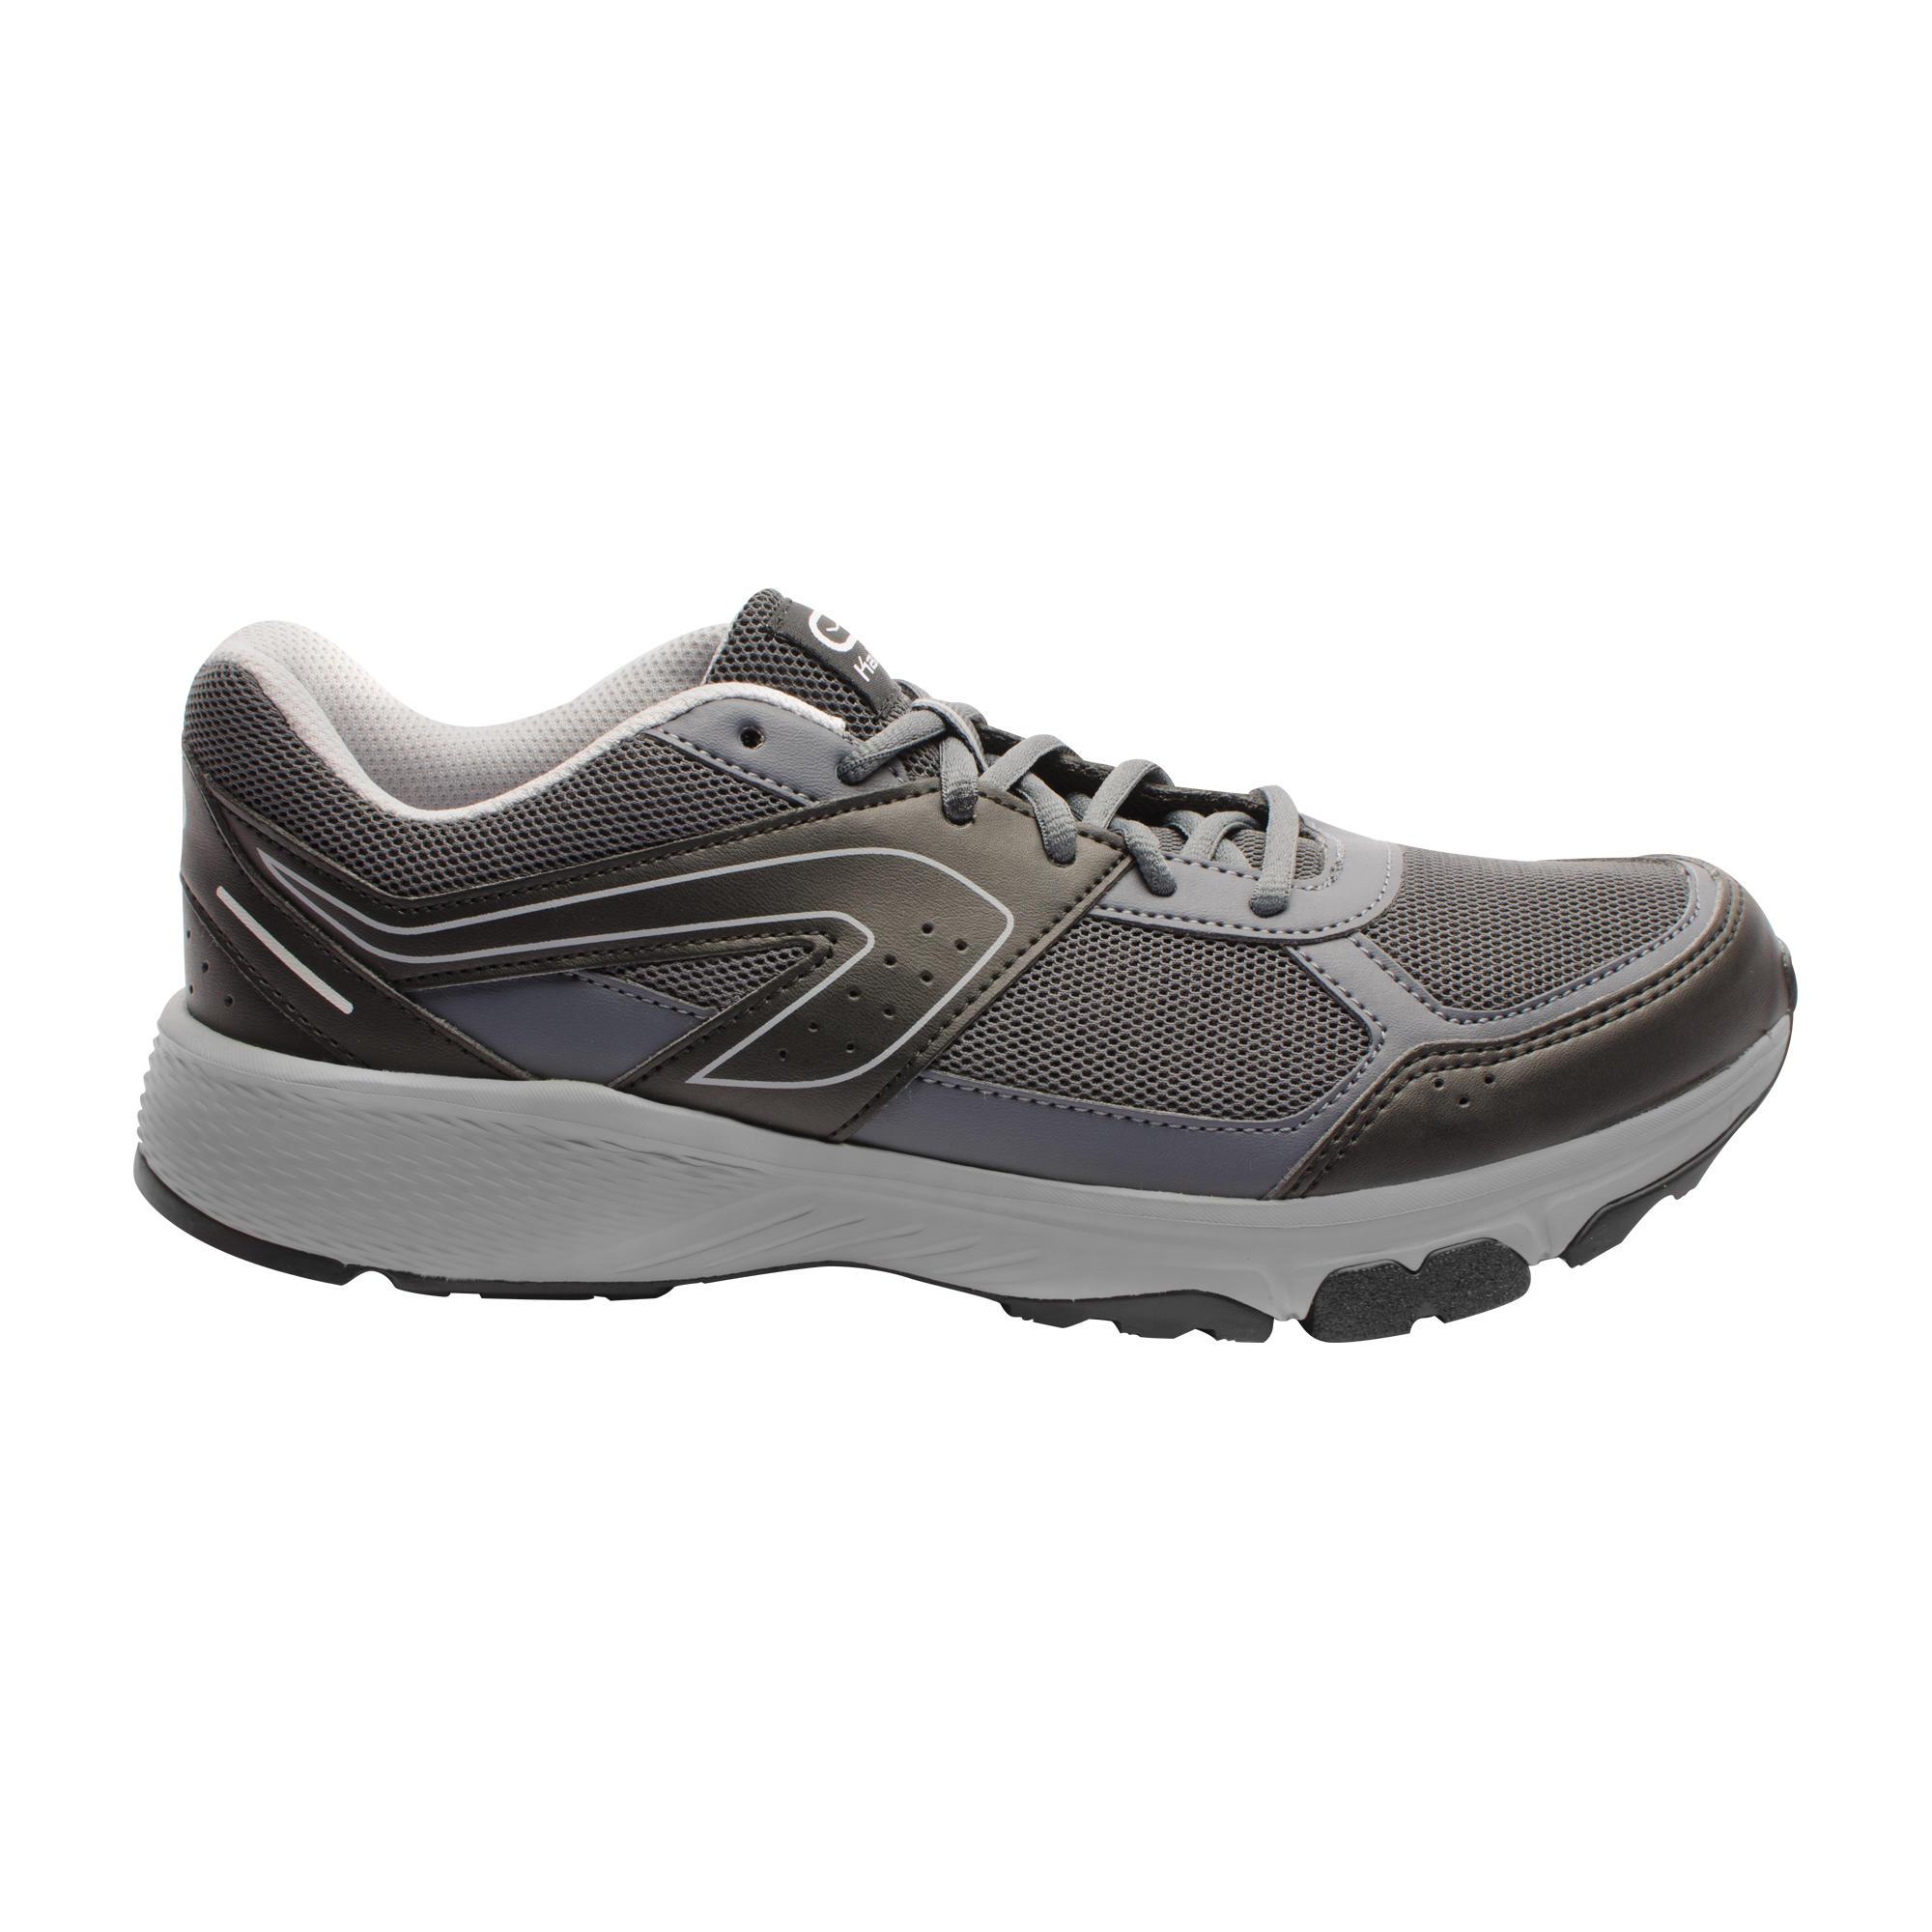 Laufschuhe Run Cushion Grip Herren   Schuhe > Sportschuhe > Laufschuhe   Kalenji